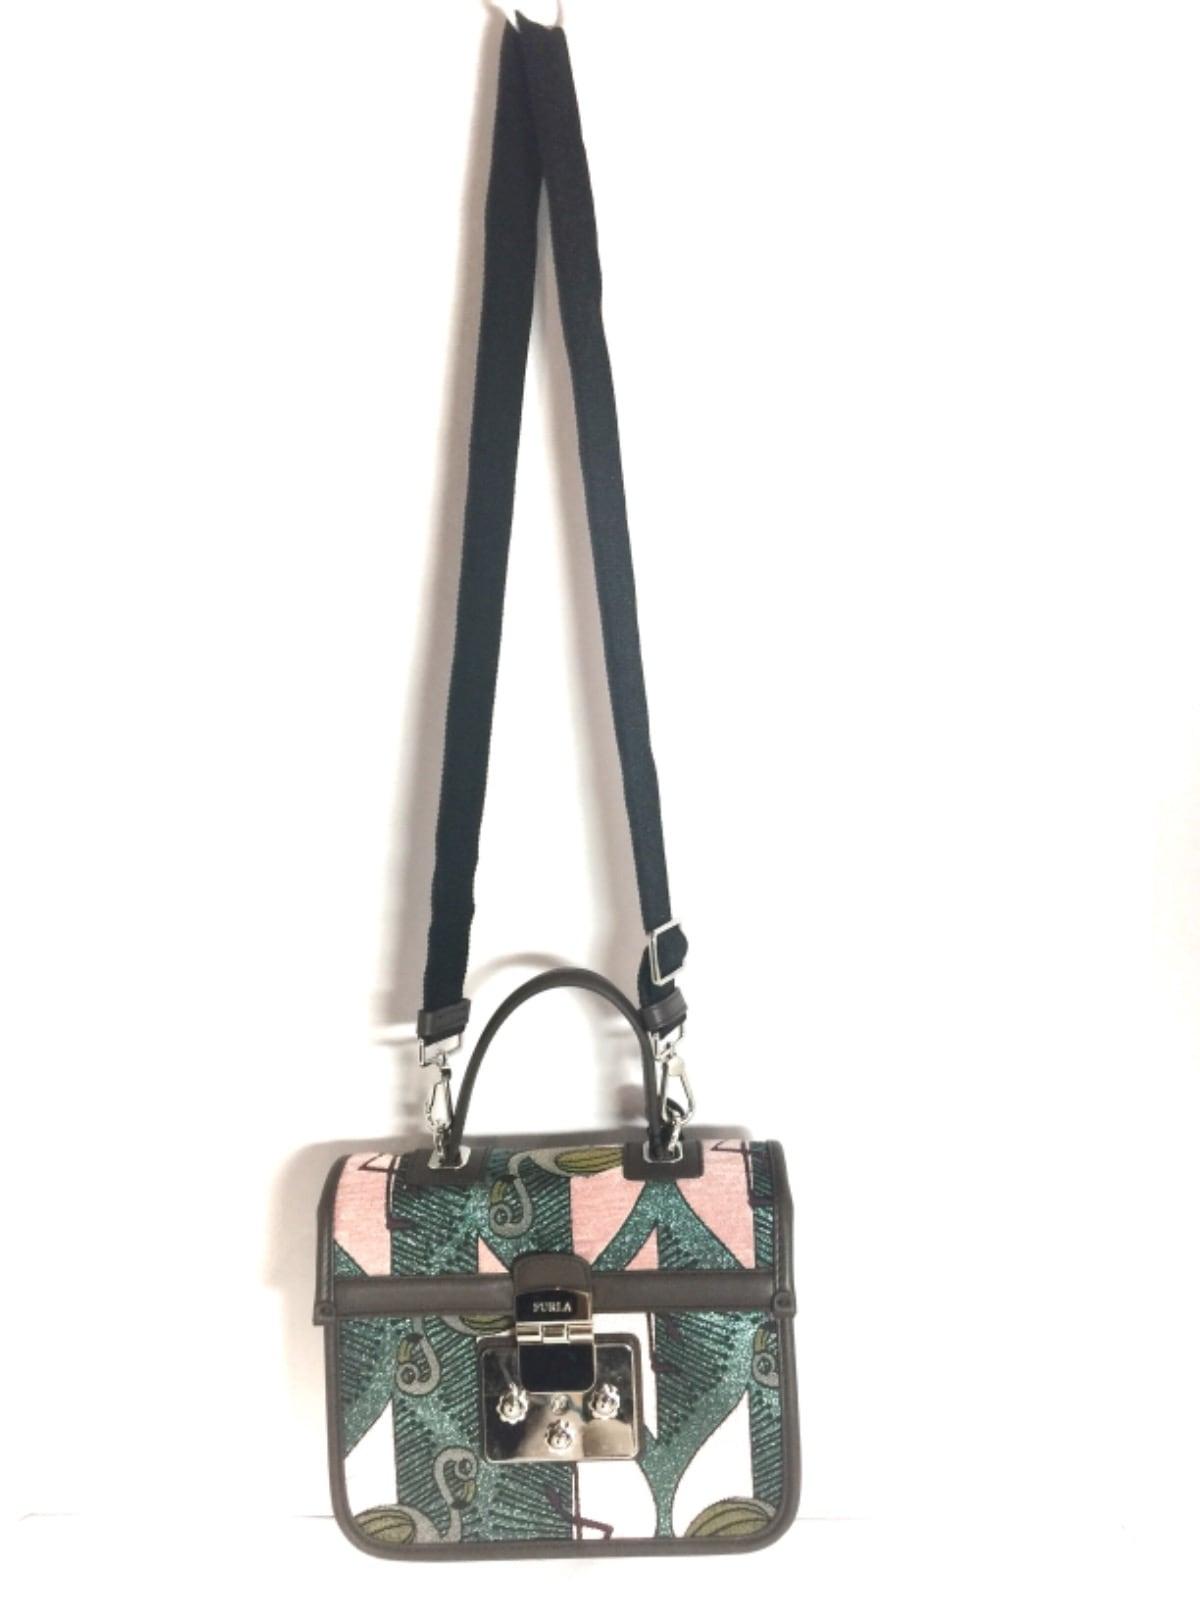 3885a3e62754 ... FURLA(フルラ) ハンドバッグ美品 グリーン×マルチ ラメ/フラミンゴ ...